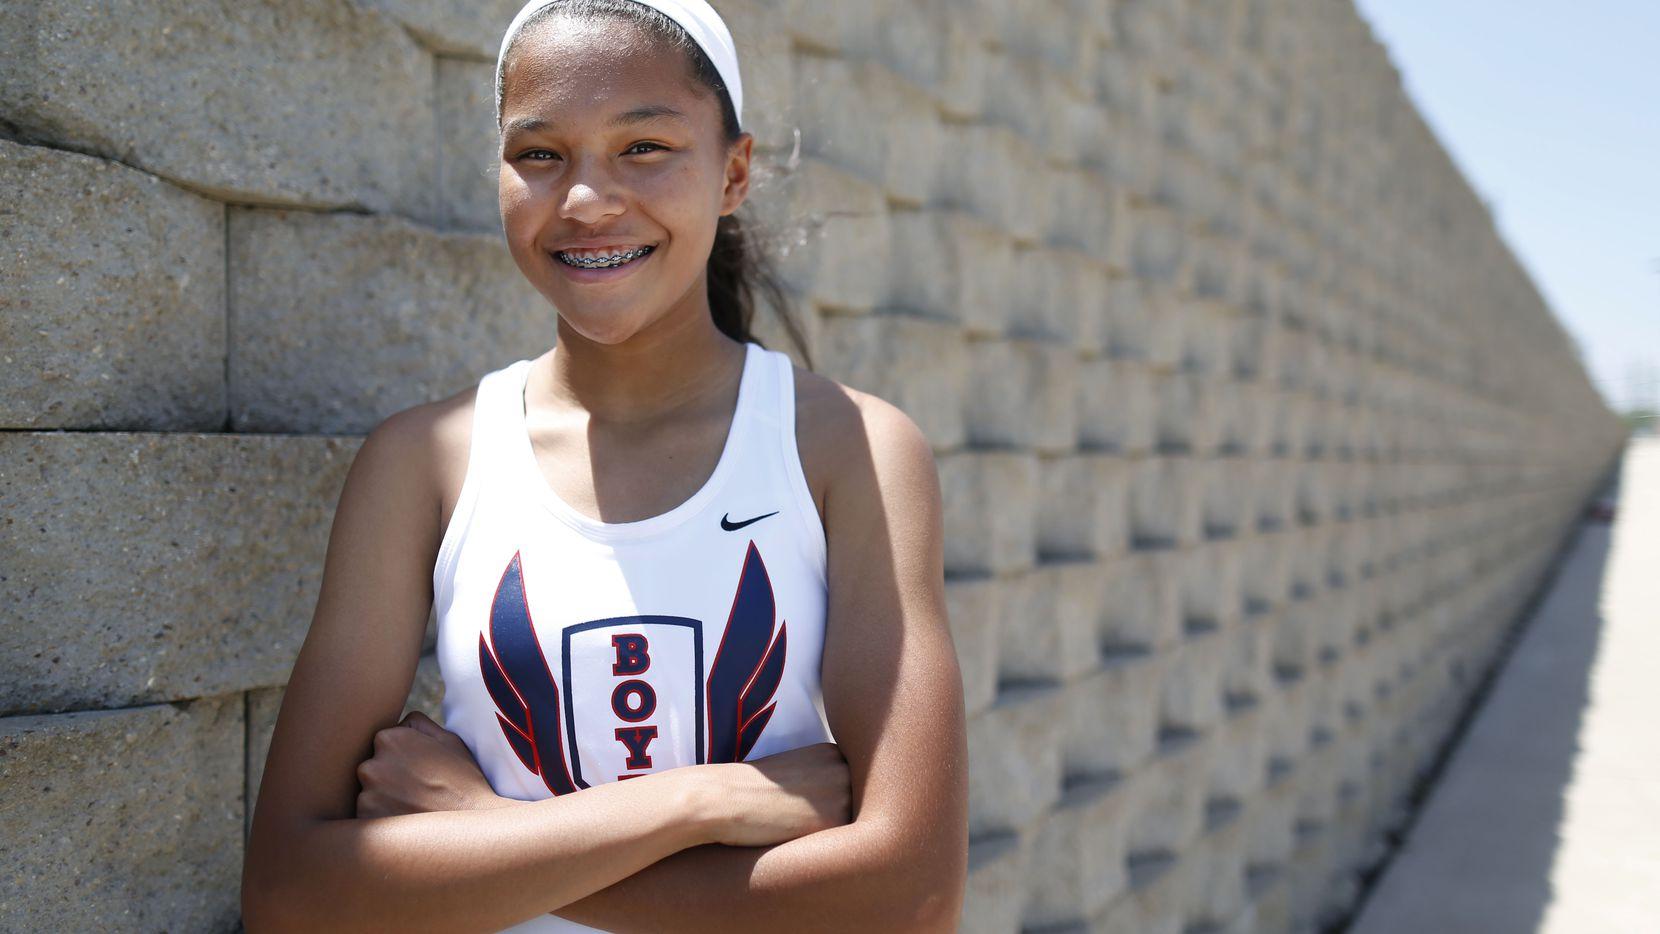 Girls Track Athlete of the Year, Aaliyah Miller of McKinney Boyd High School